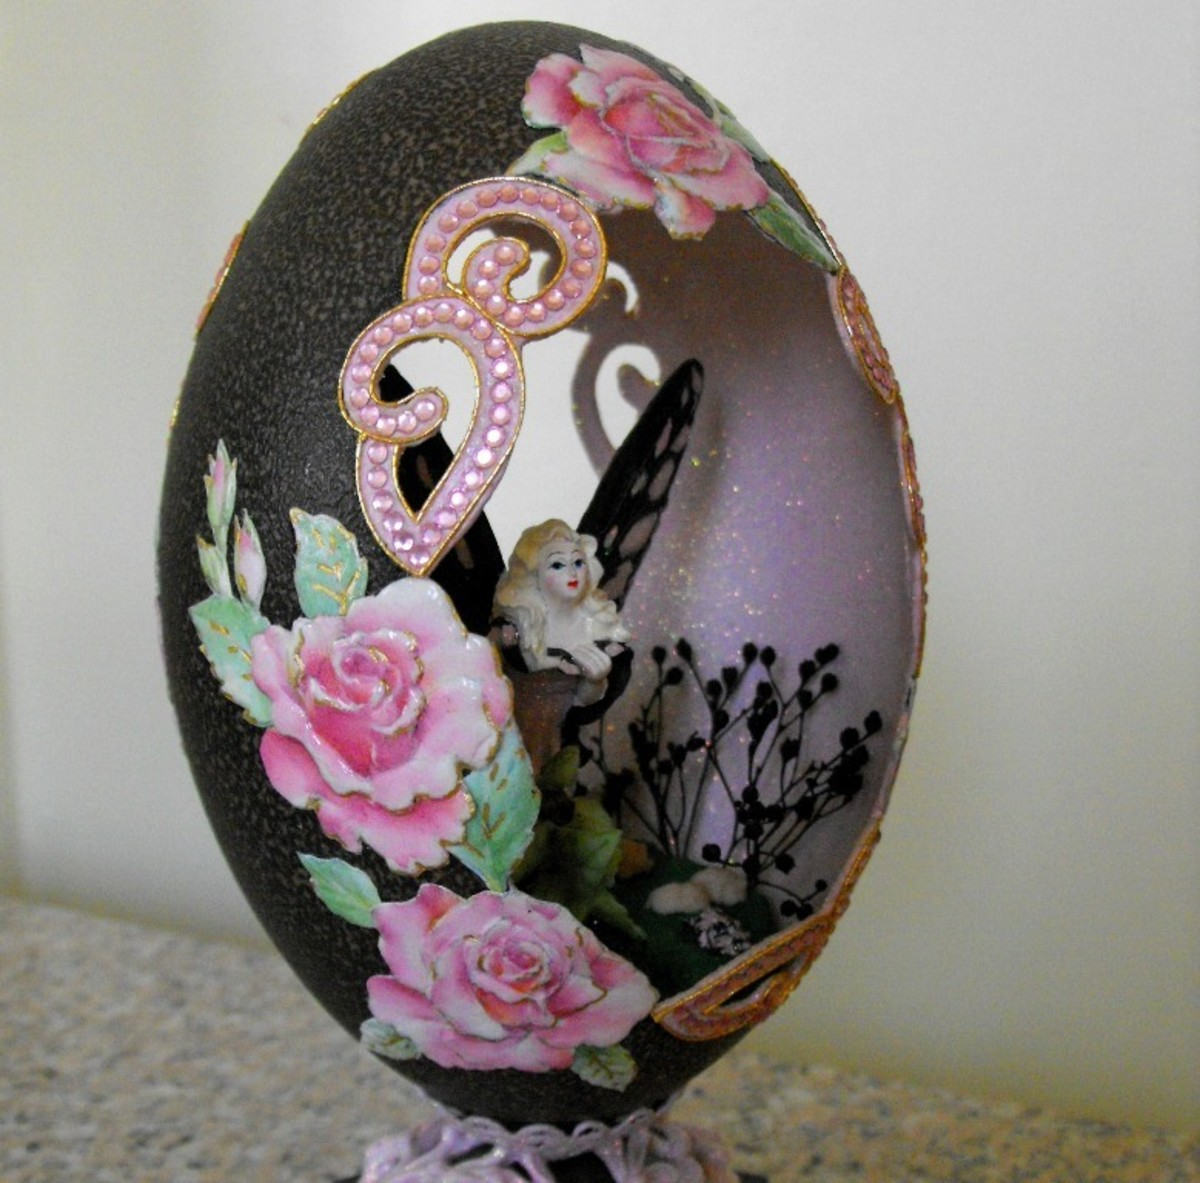 decorative_eggs